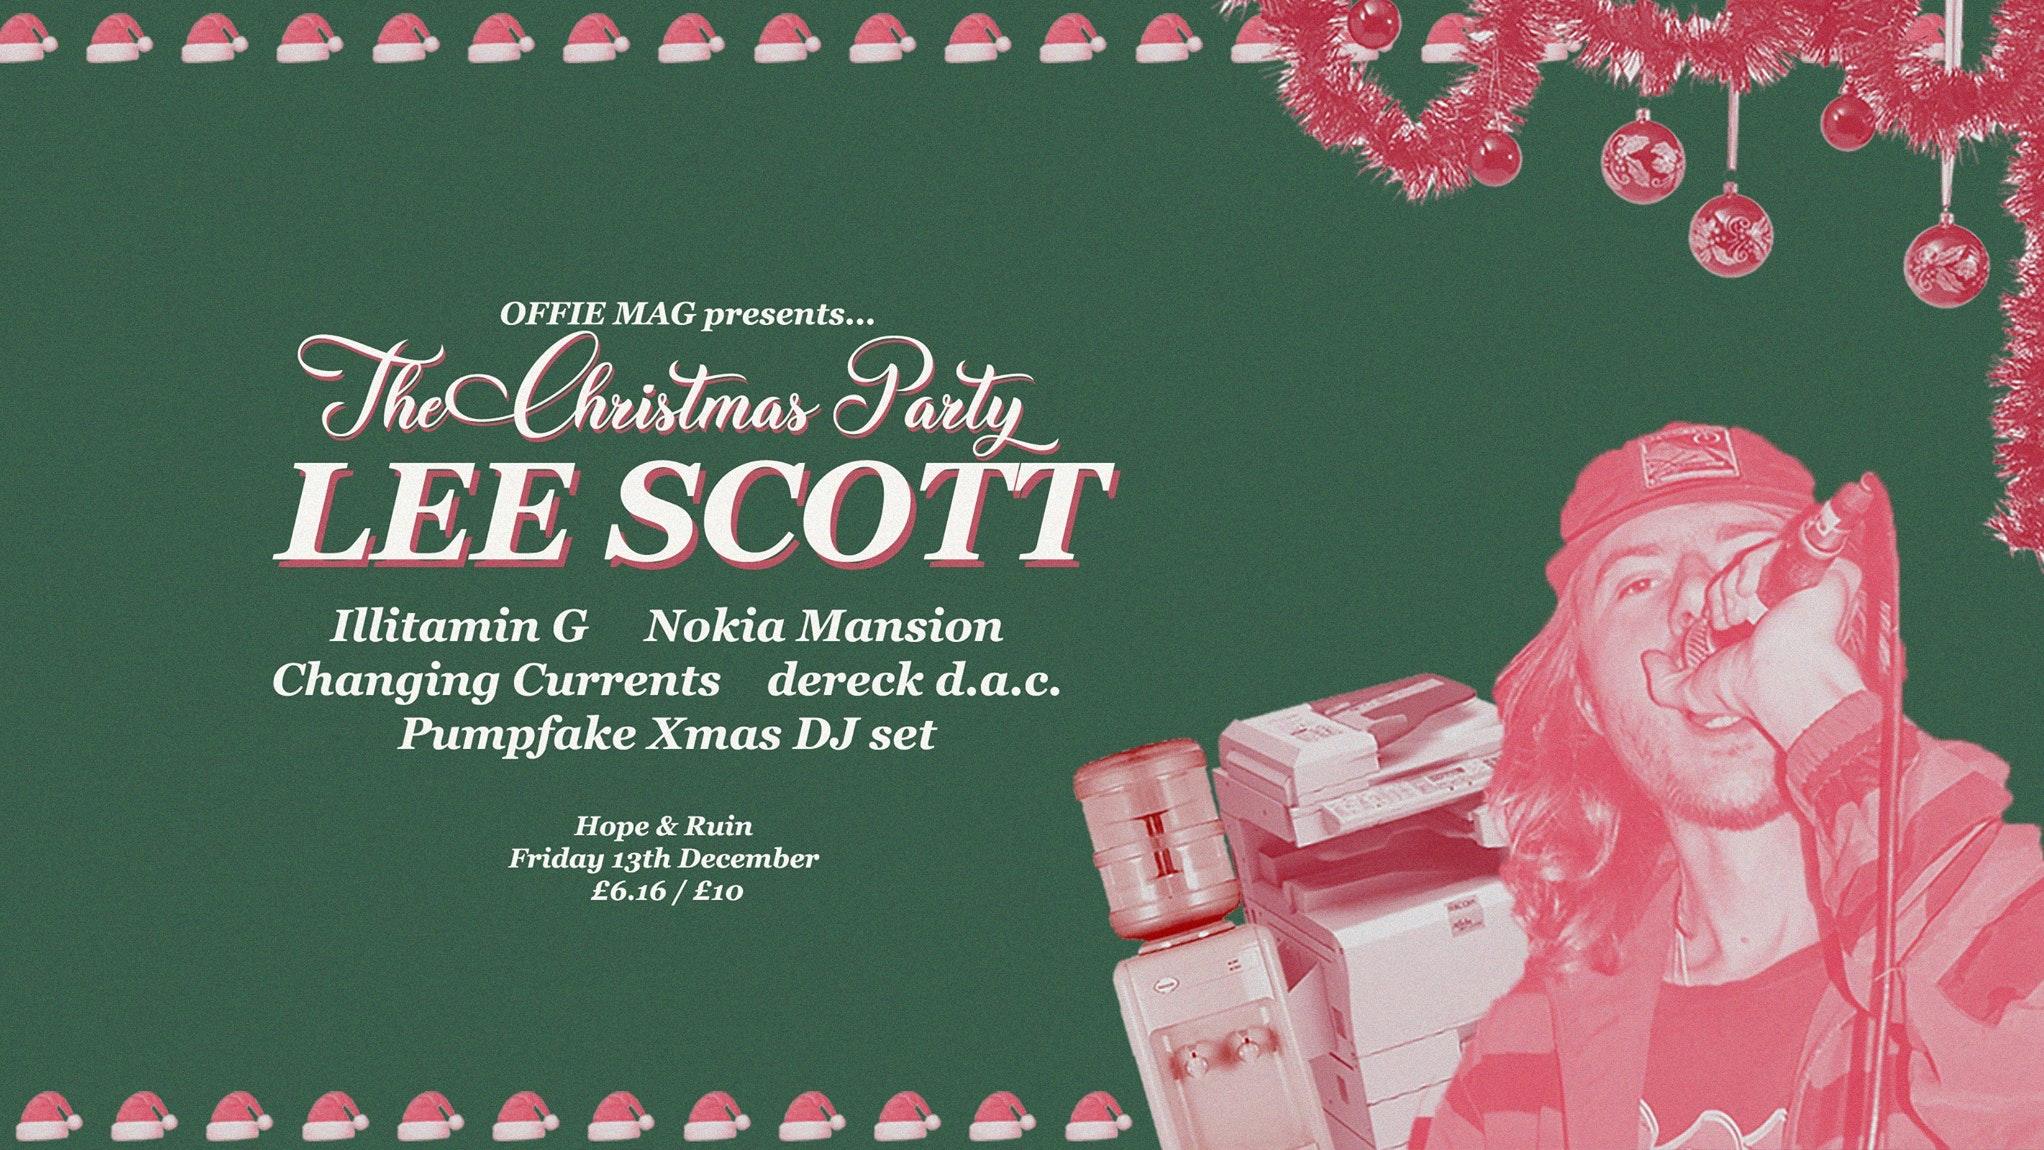 OFFIE MAG Xmas Party: Lee Scott + Nokia Mansion + Changing Currents + Illitamin G + dereck d.a.c.